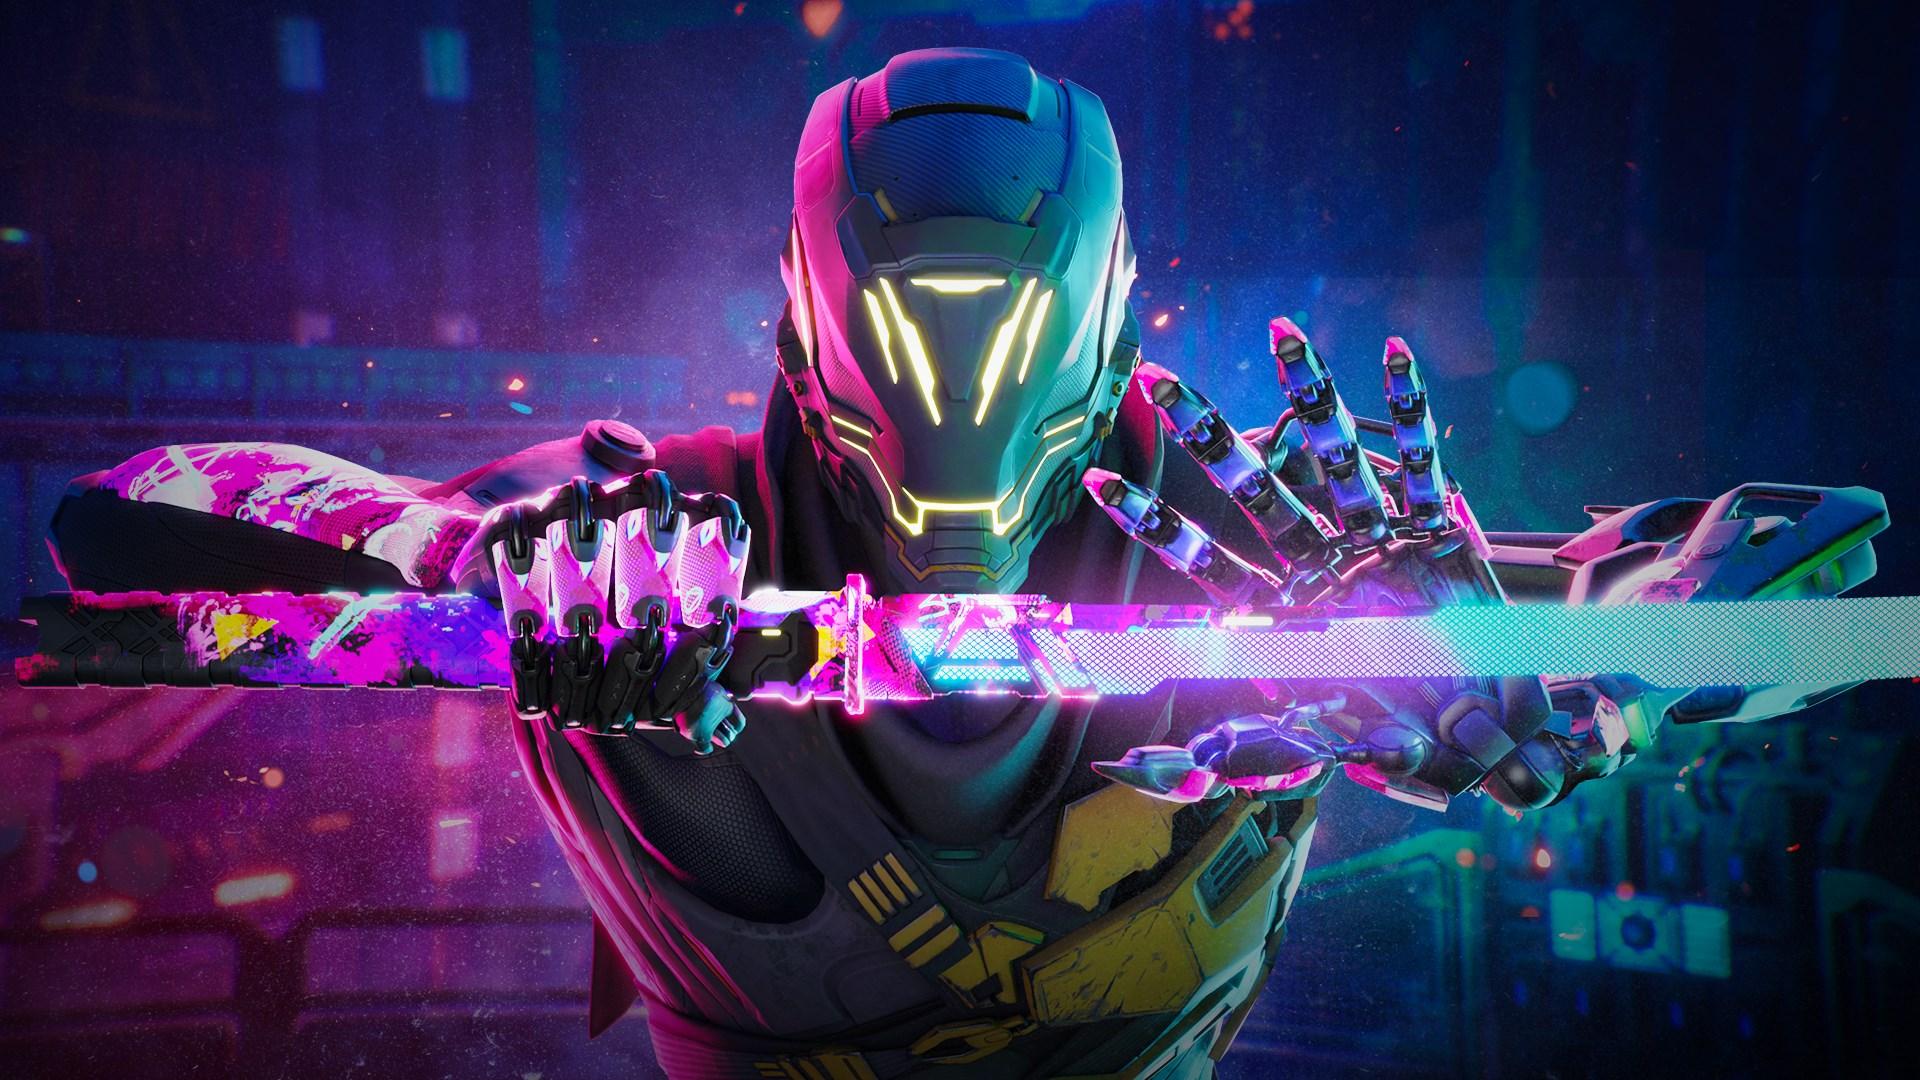 Ghostrunner: Neon Pack